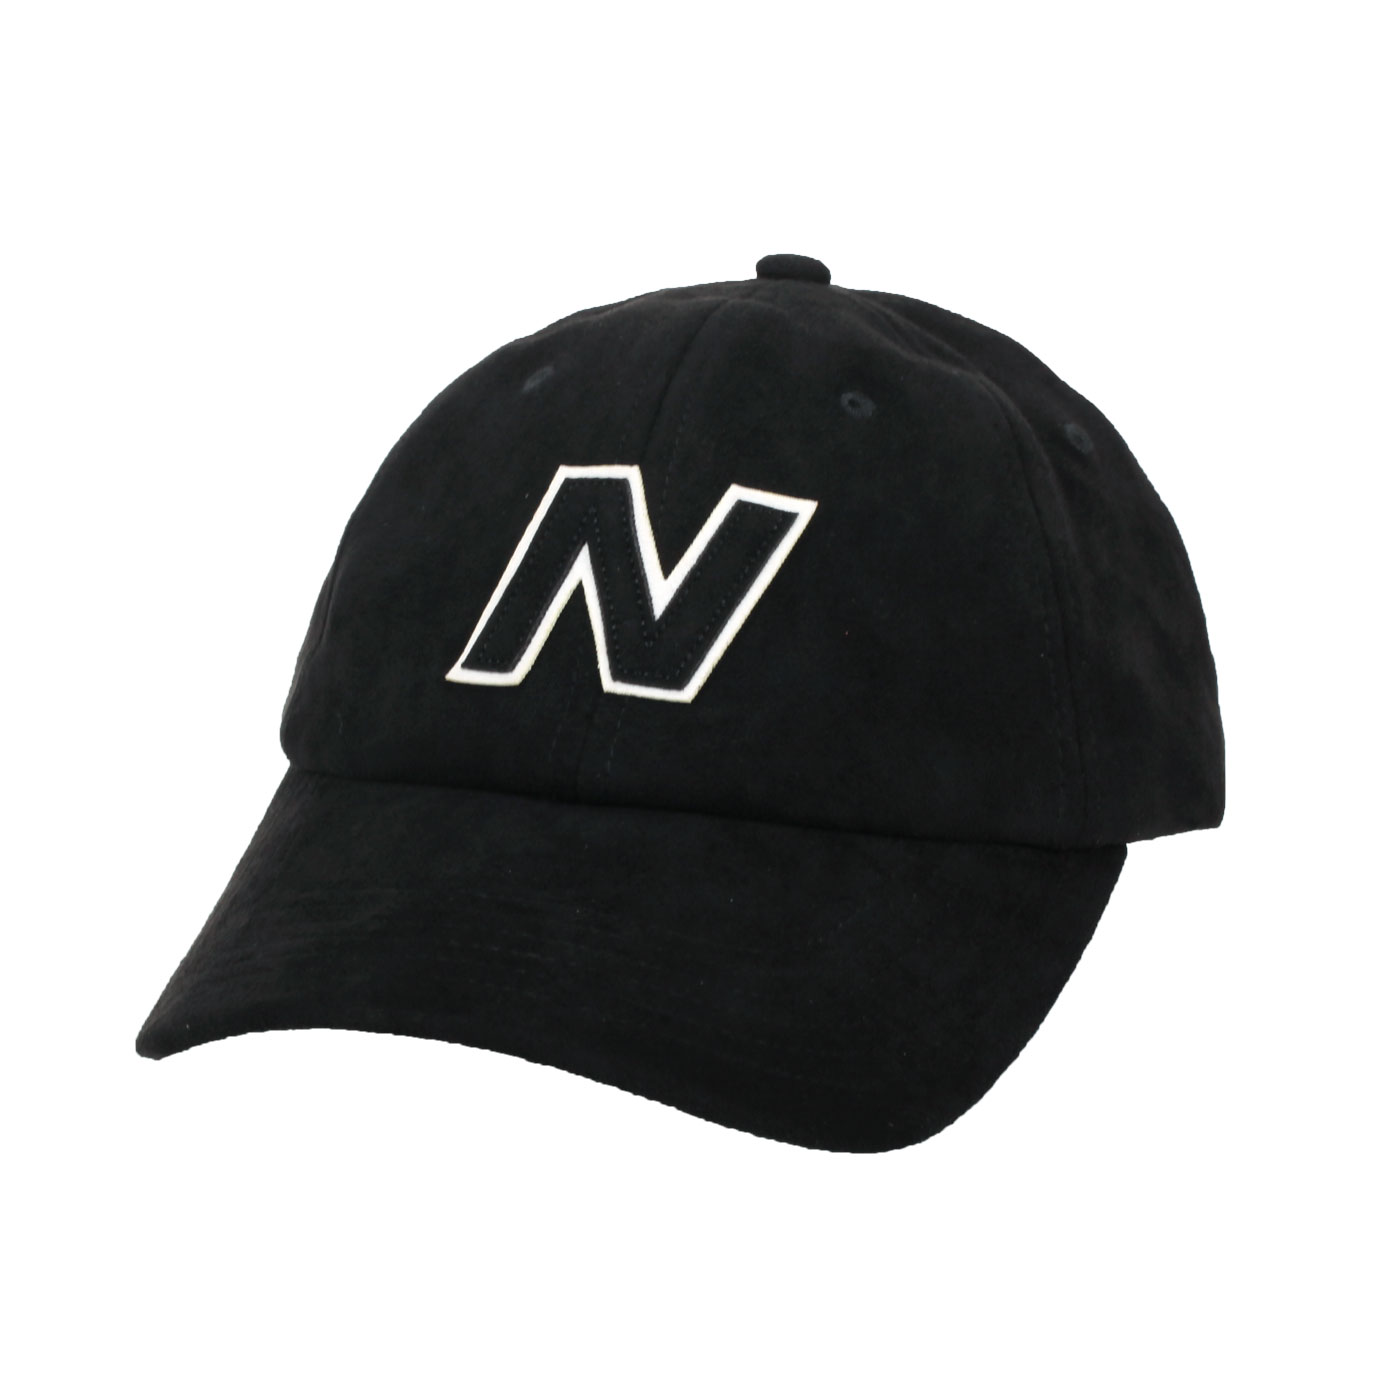 NEW BALANCE 棒球帽 LAH03001BK - 黑白